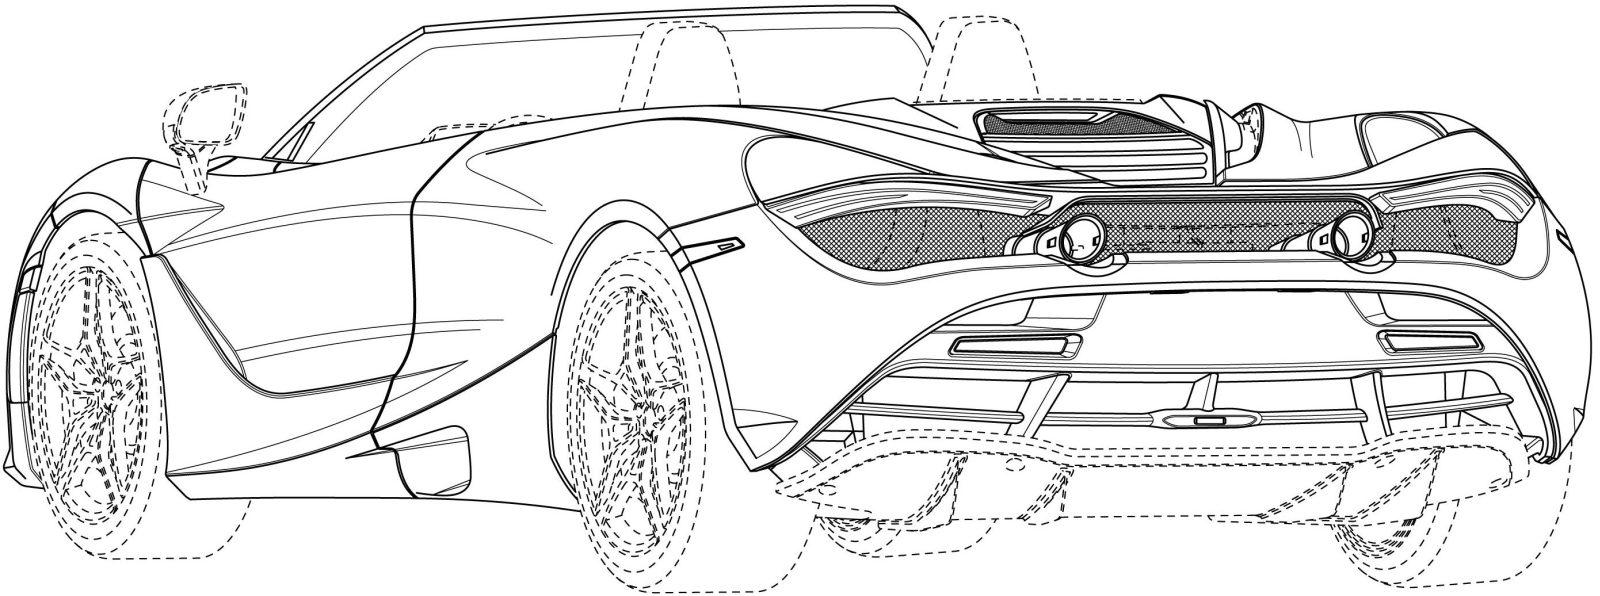 Mclaren 720s Spider Sketch Rear 2 Autonetmagz Review Mobil Dan Motor Baru Indonesia